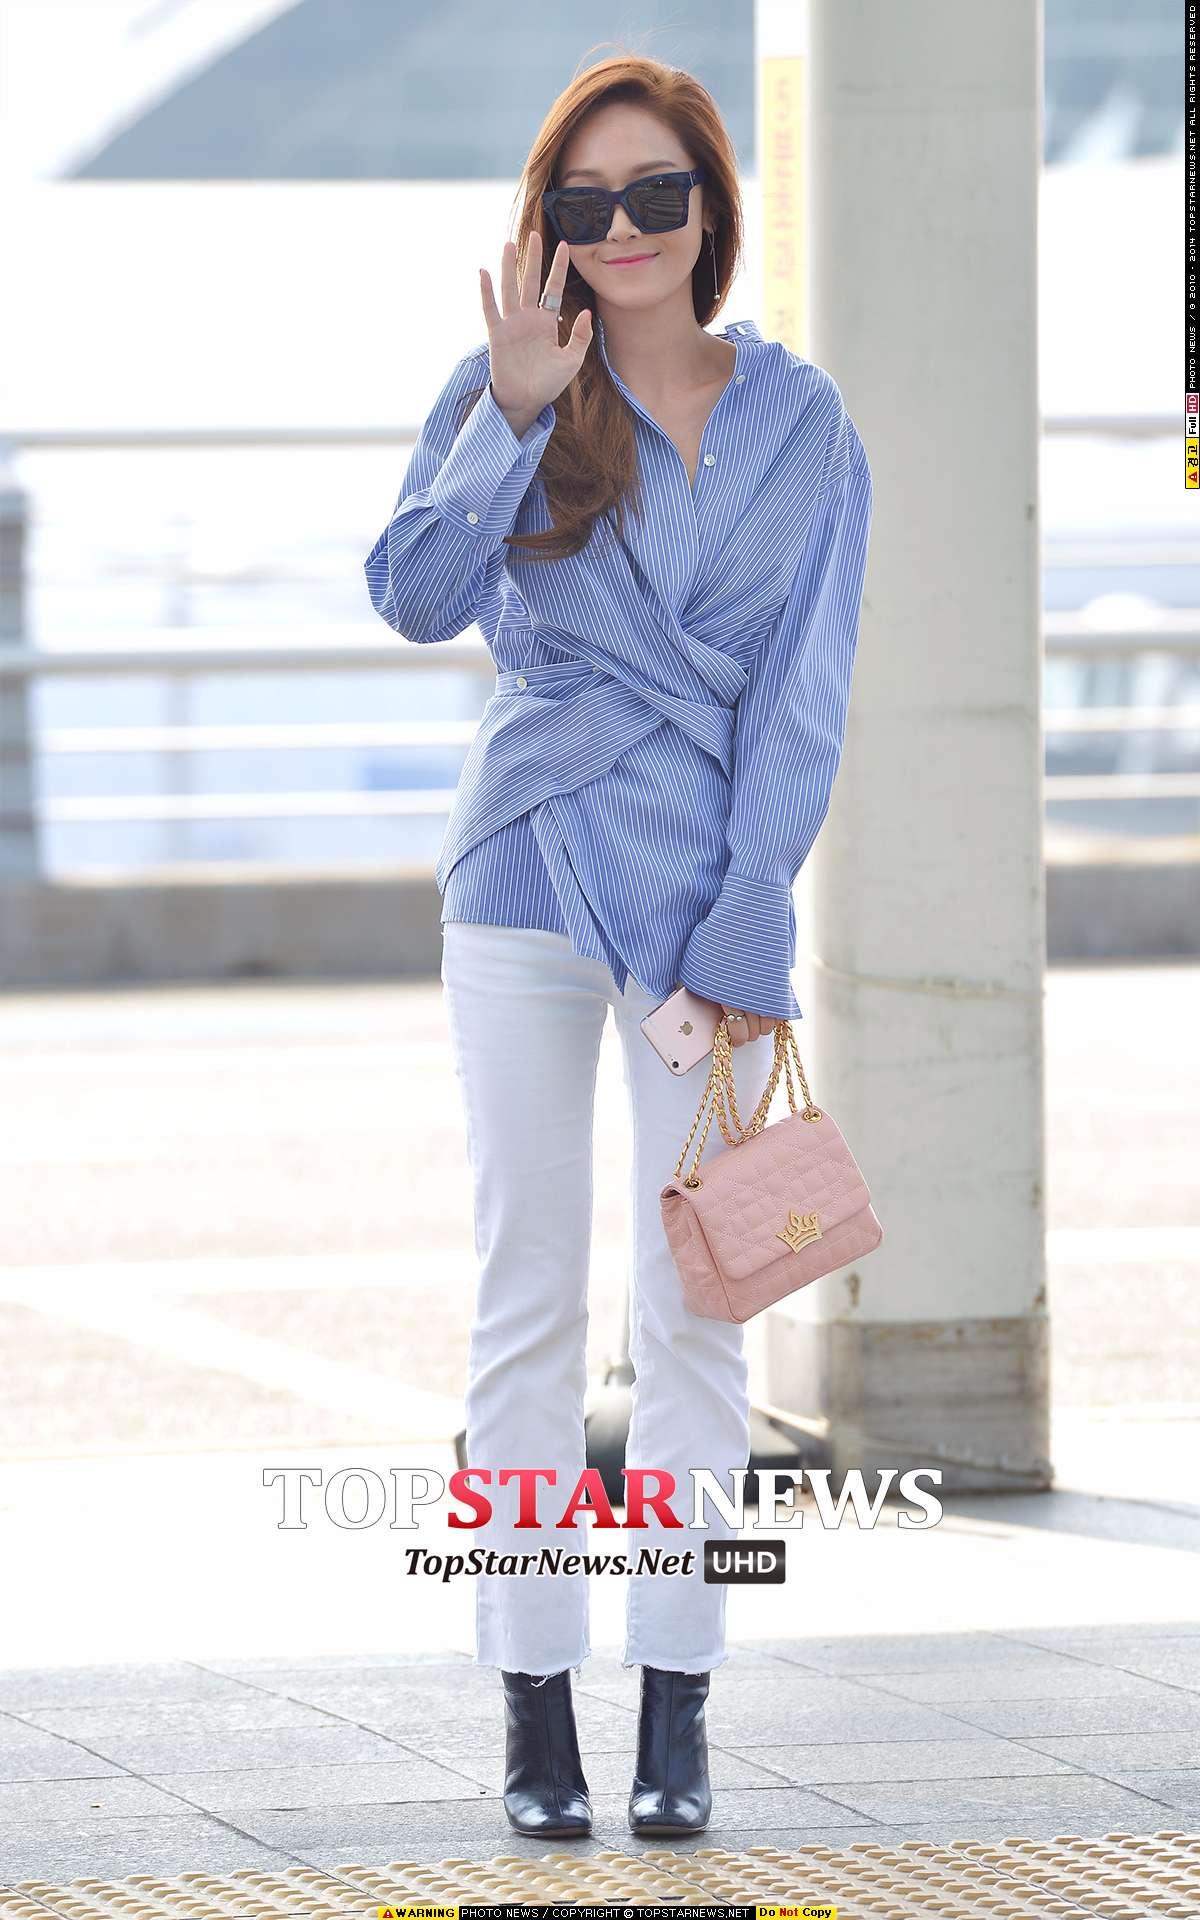 ◇Jessica 上衣 Brand:NICE CLAUP Price:約10萬韓元(台幣約3000元)